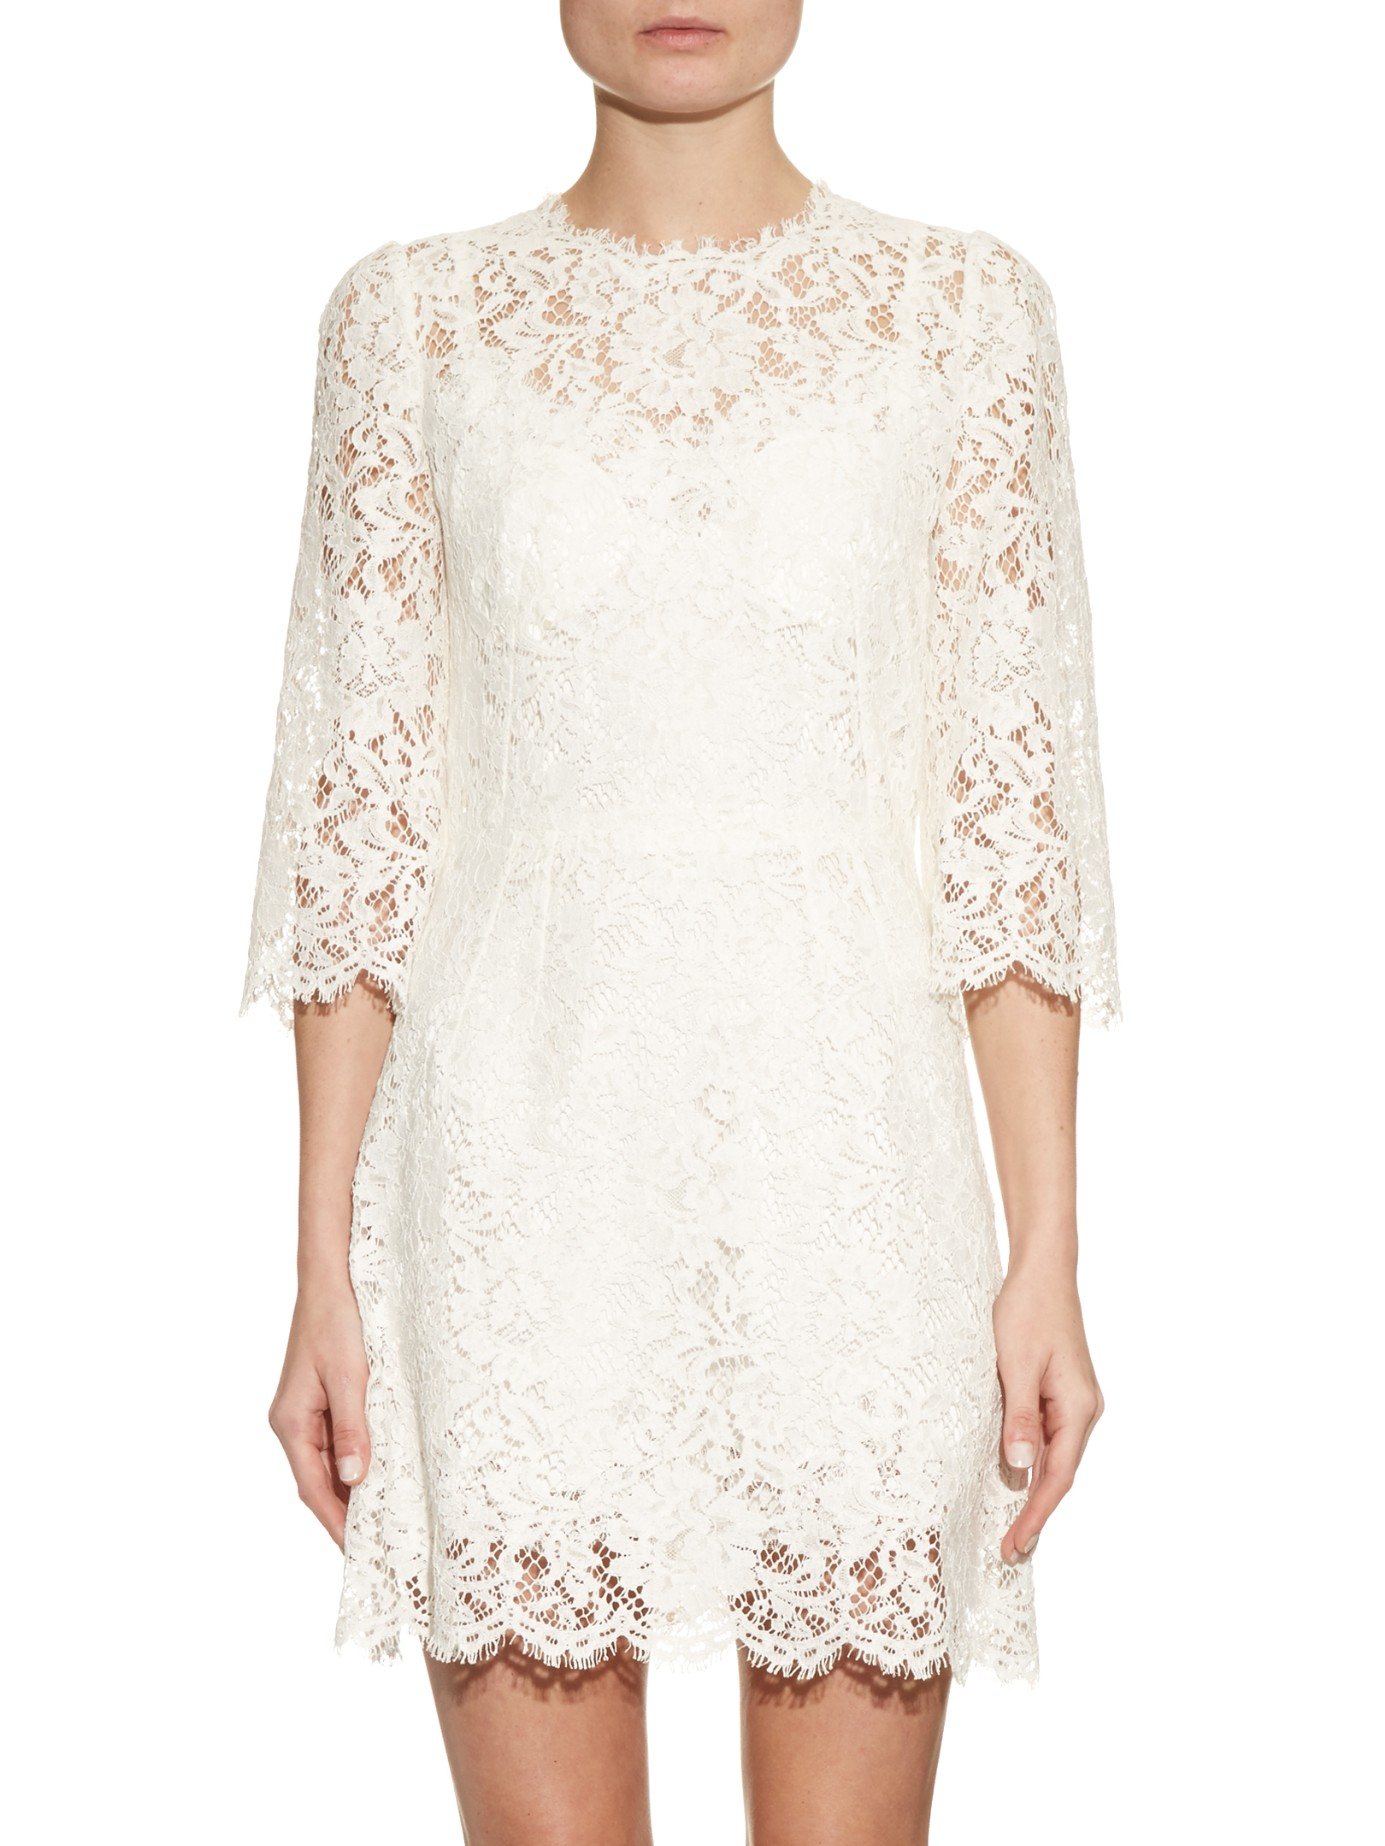 e6a4e83d7e76 In Scallop Trimmed Floral Lyst Lace Dolce Dress White Gabbana amp  XfqFI0